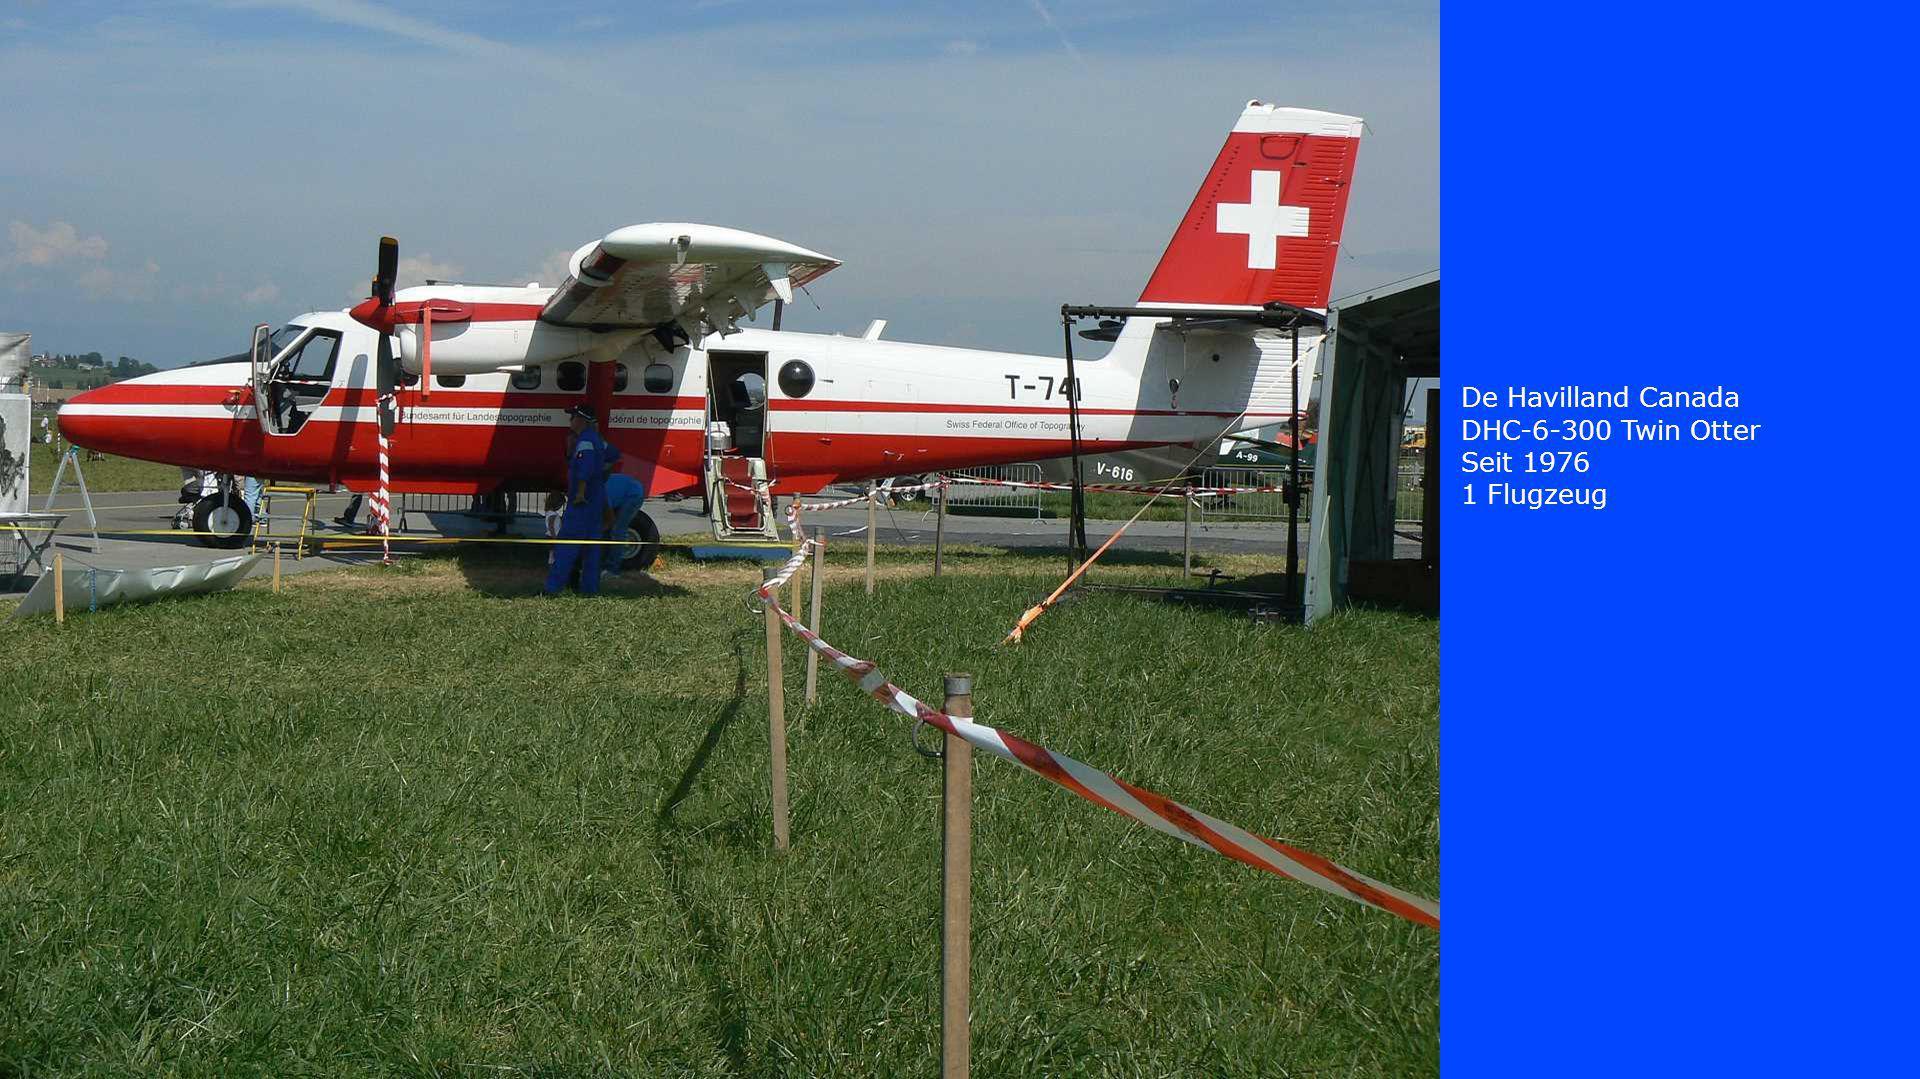 De Havilland Canada DHC-6-300 Twin Otter Seit 1976 1 Flugzeug